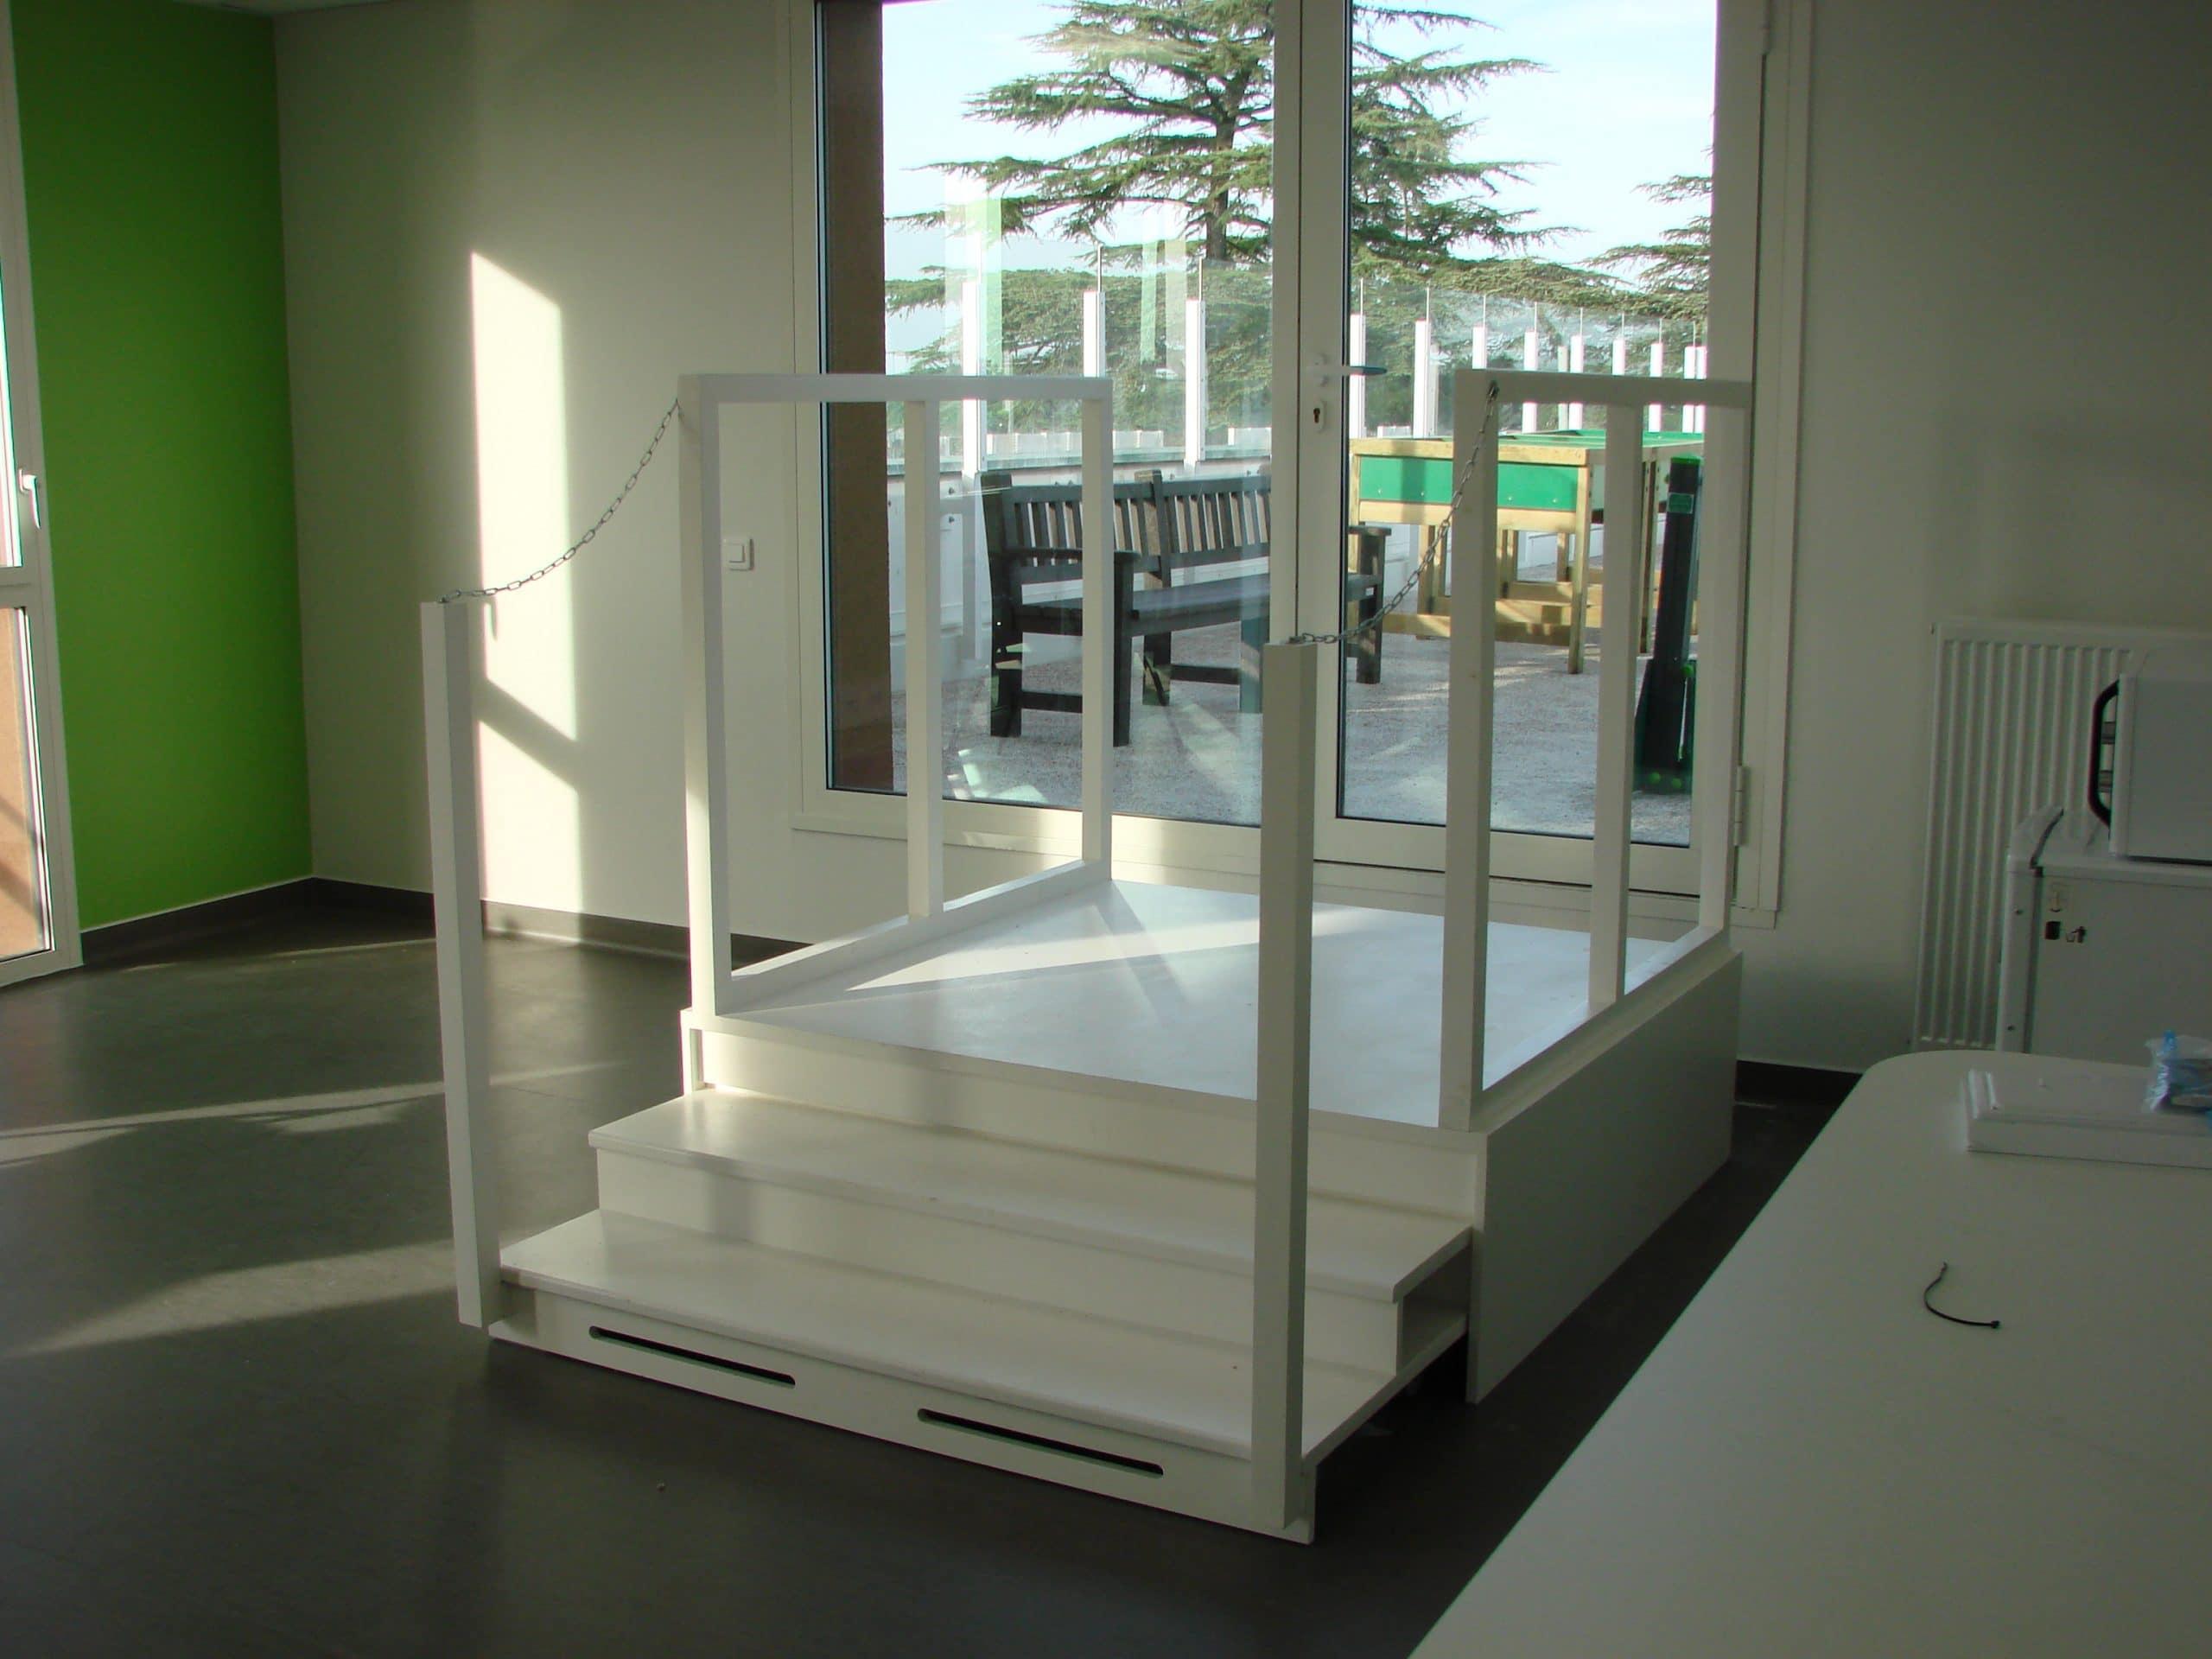 Escalier Hôpital Libourne